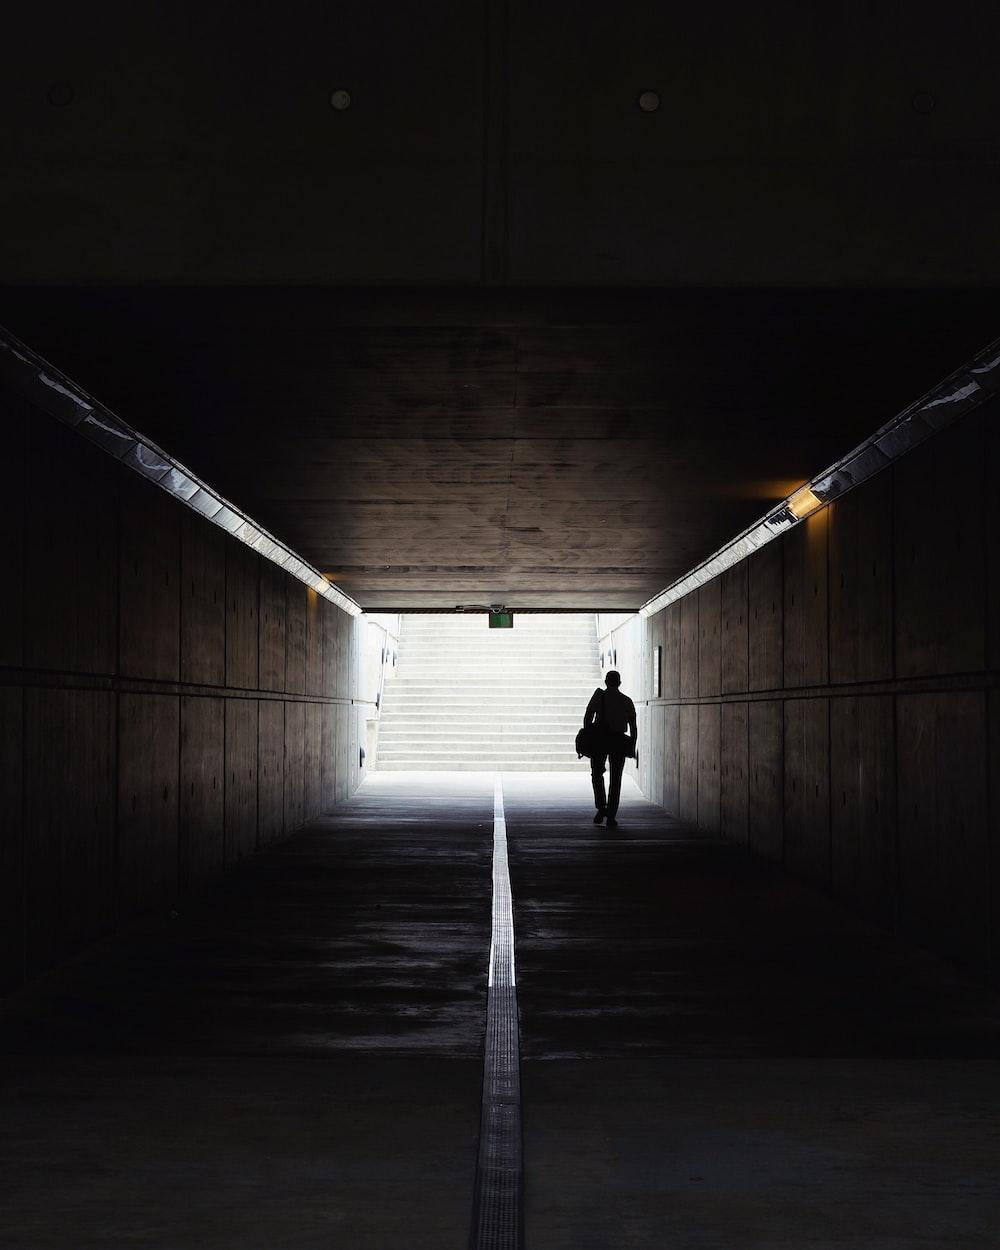 man walking on underpass